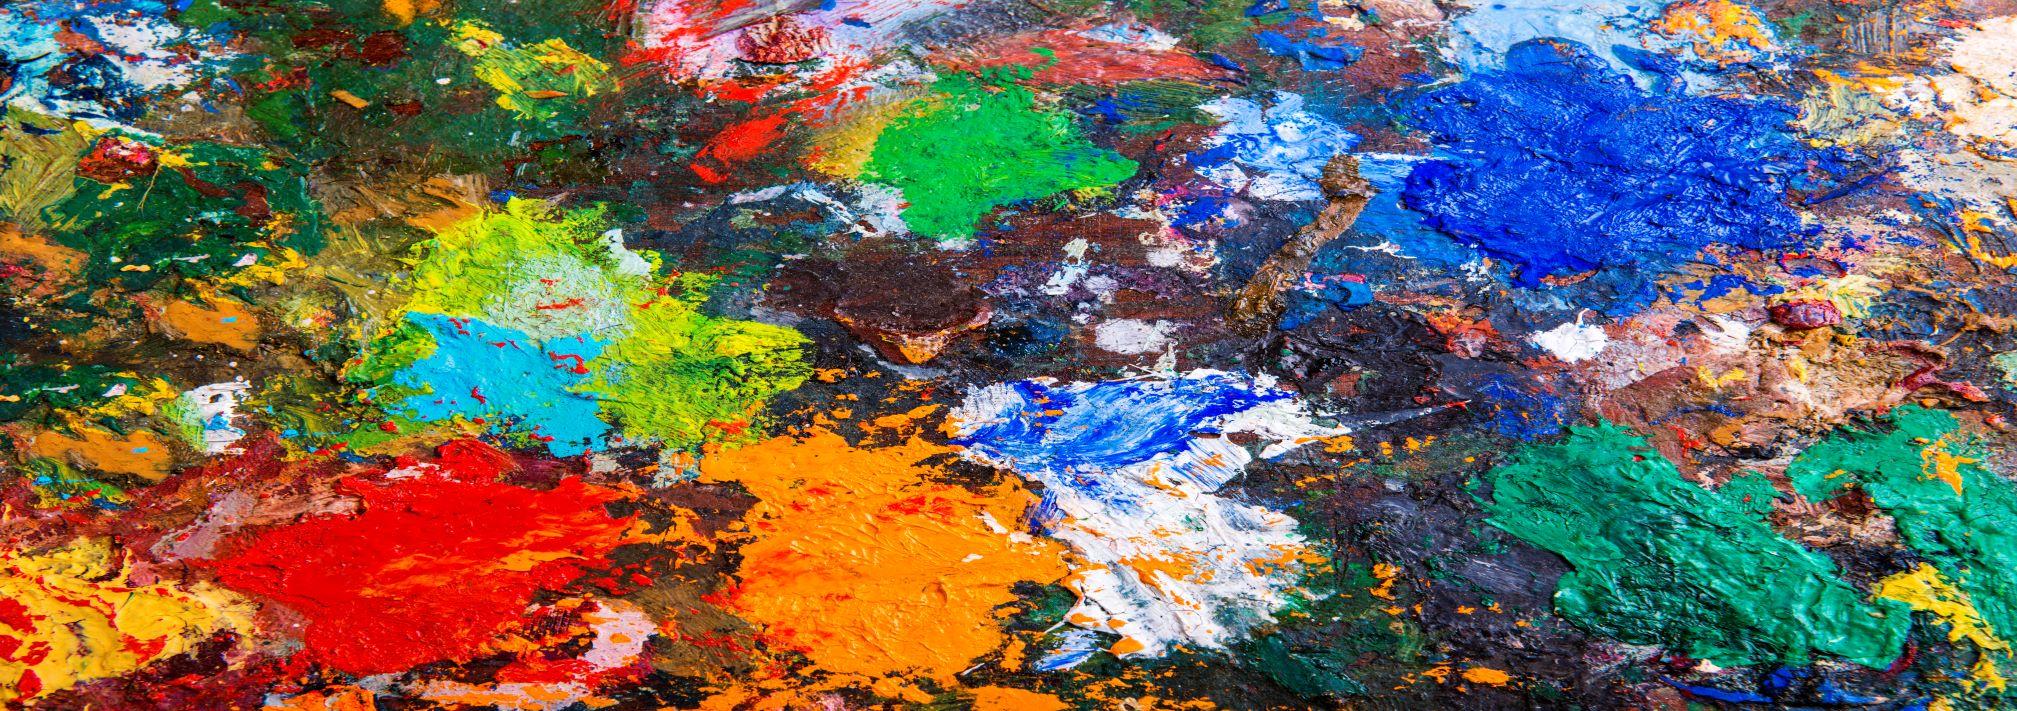 Kunstveranstaltungen